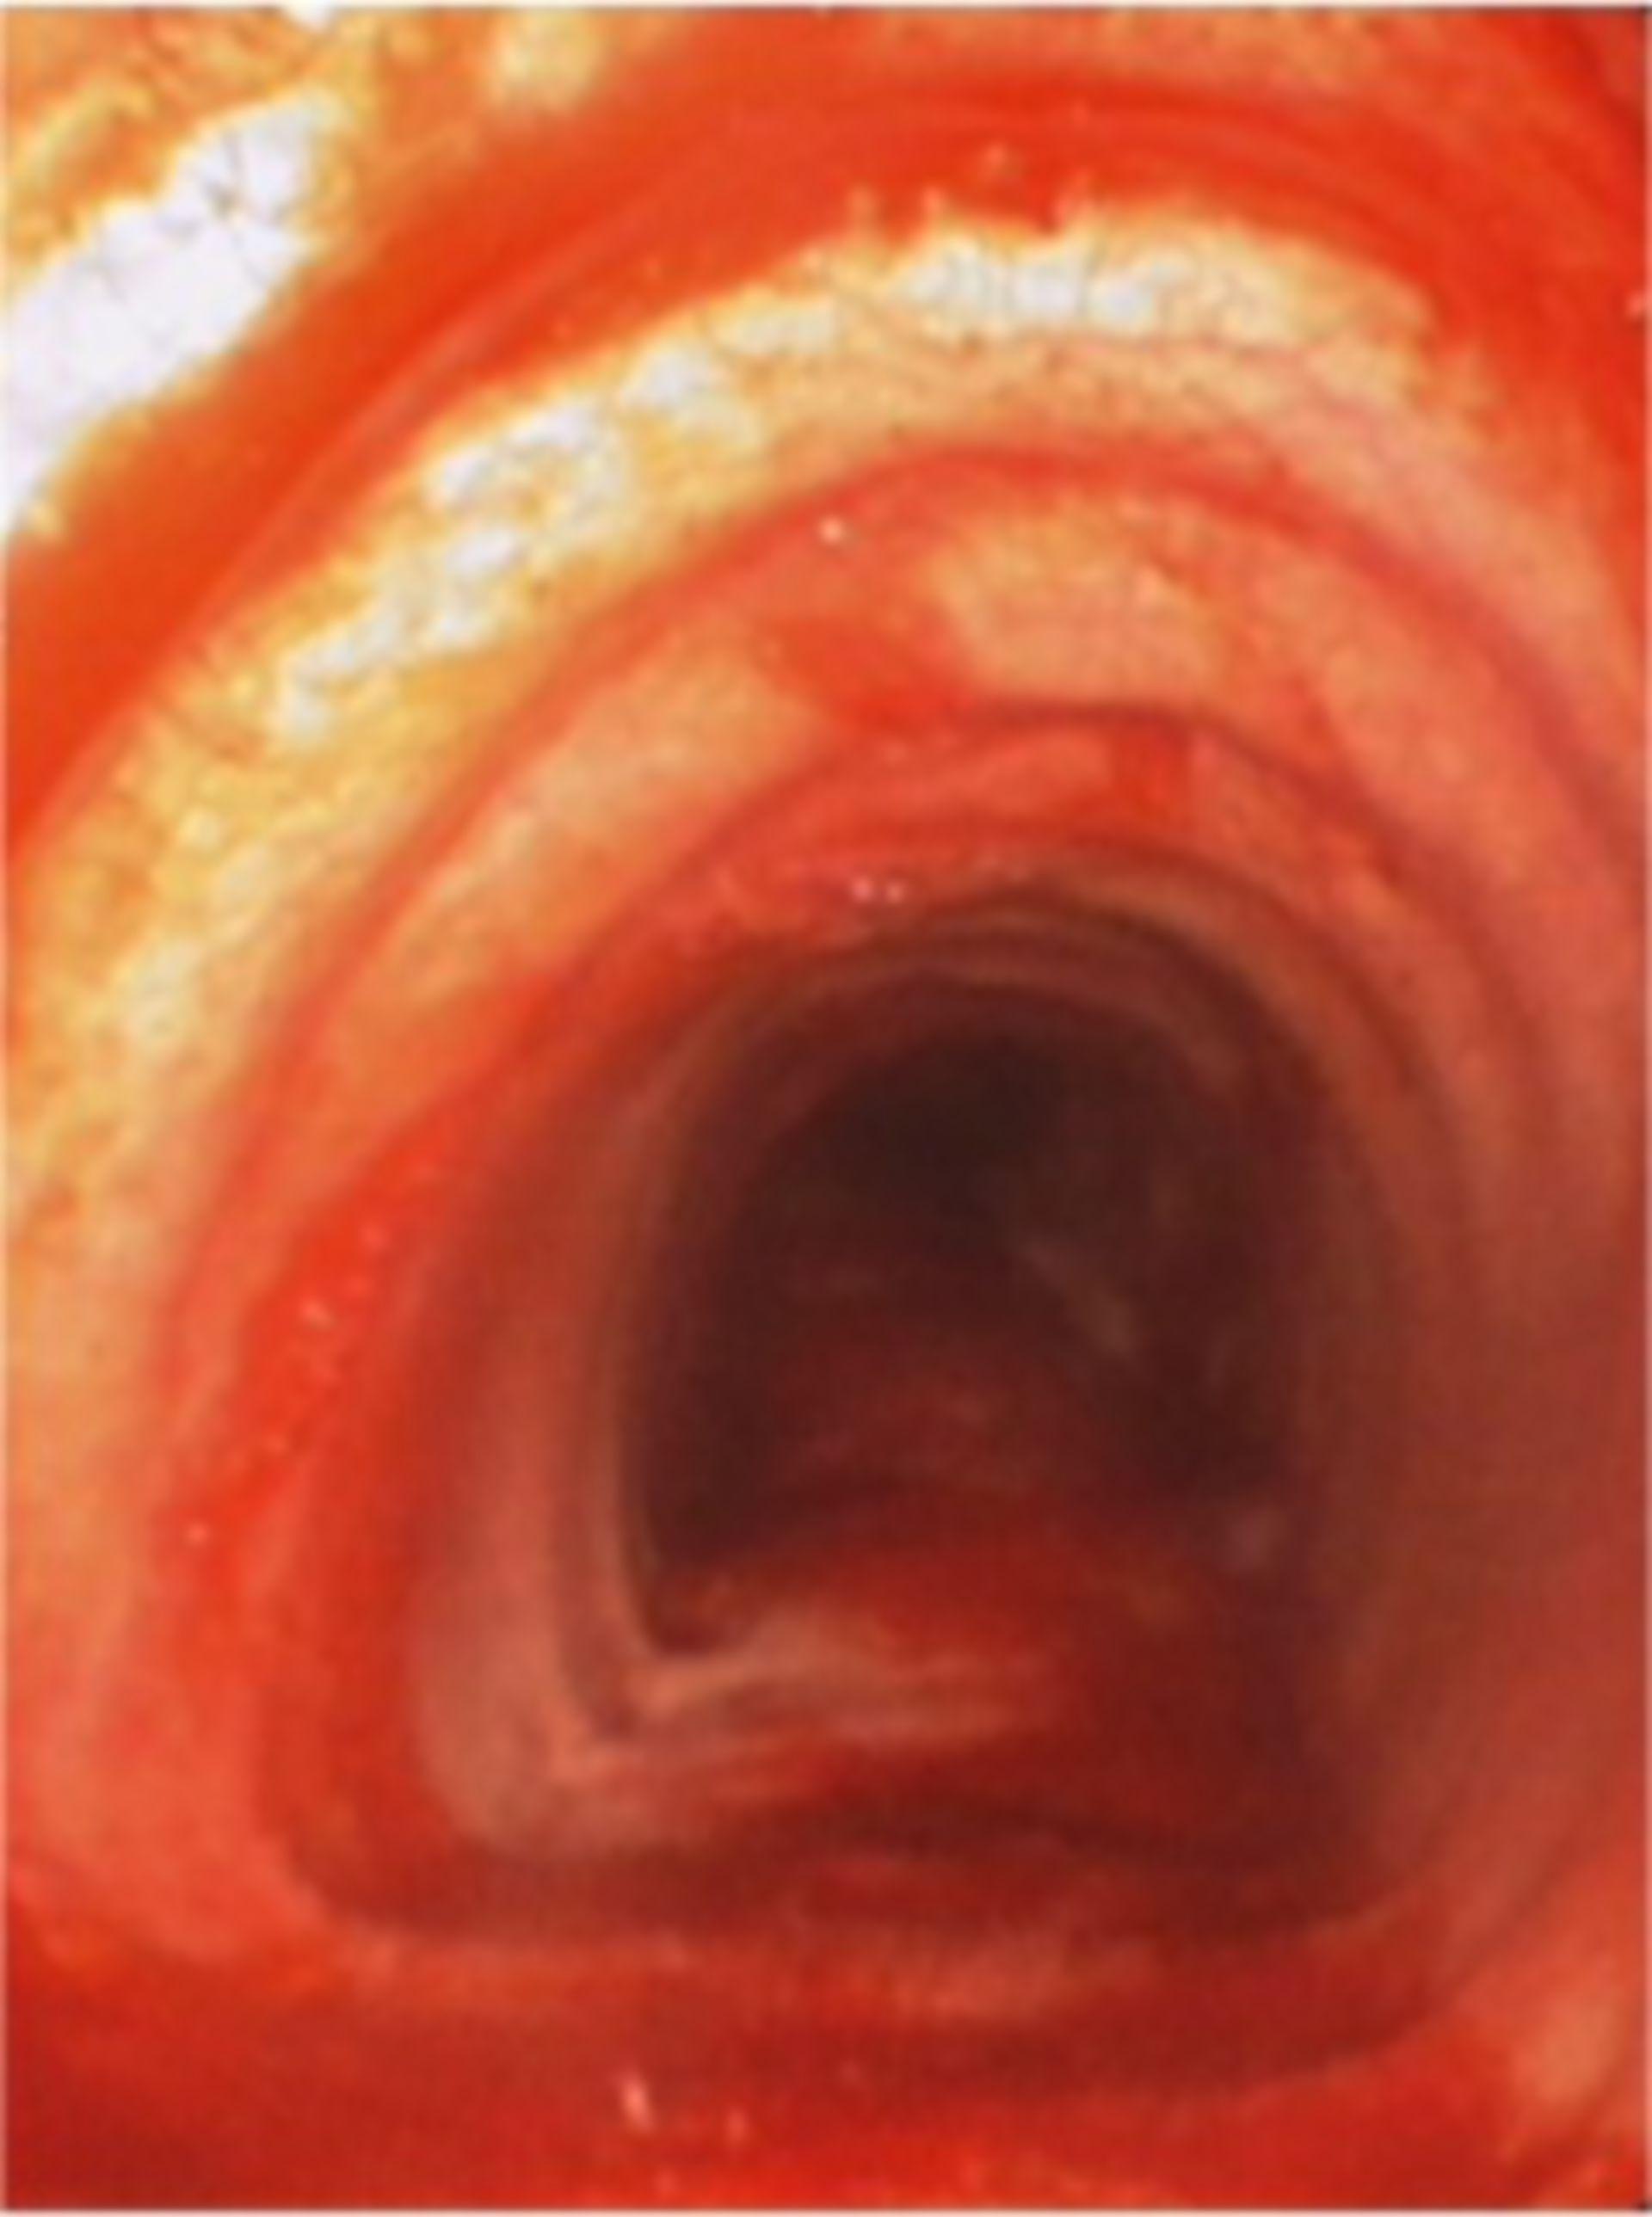 Endobronchiale Blutung